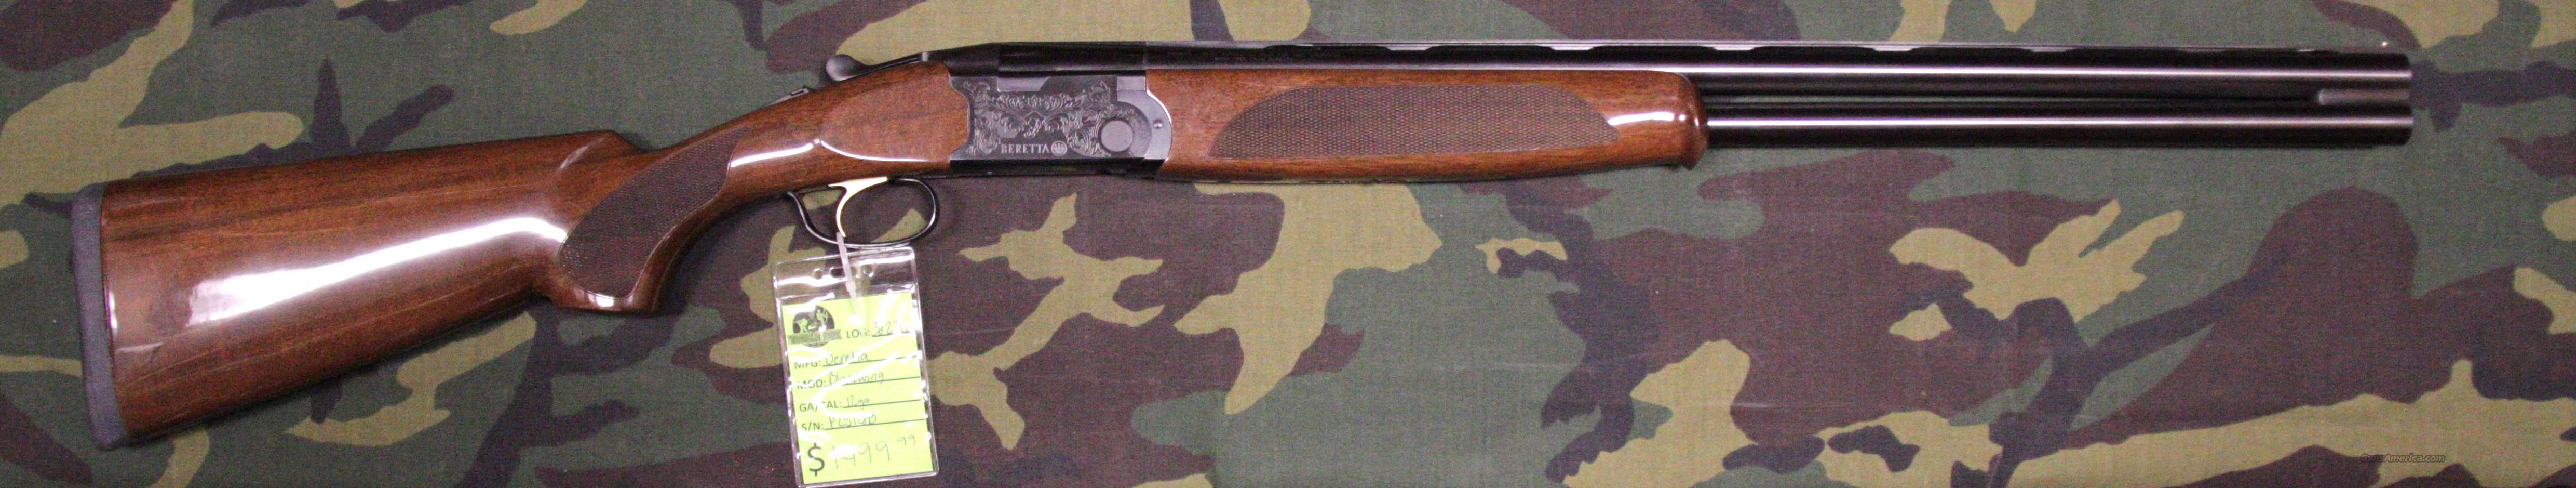 Beretta Blackwing 12ga O/U Shotgun